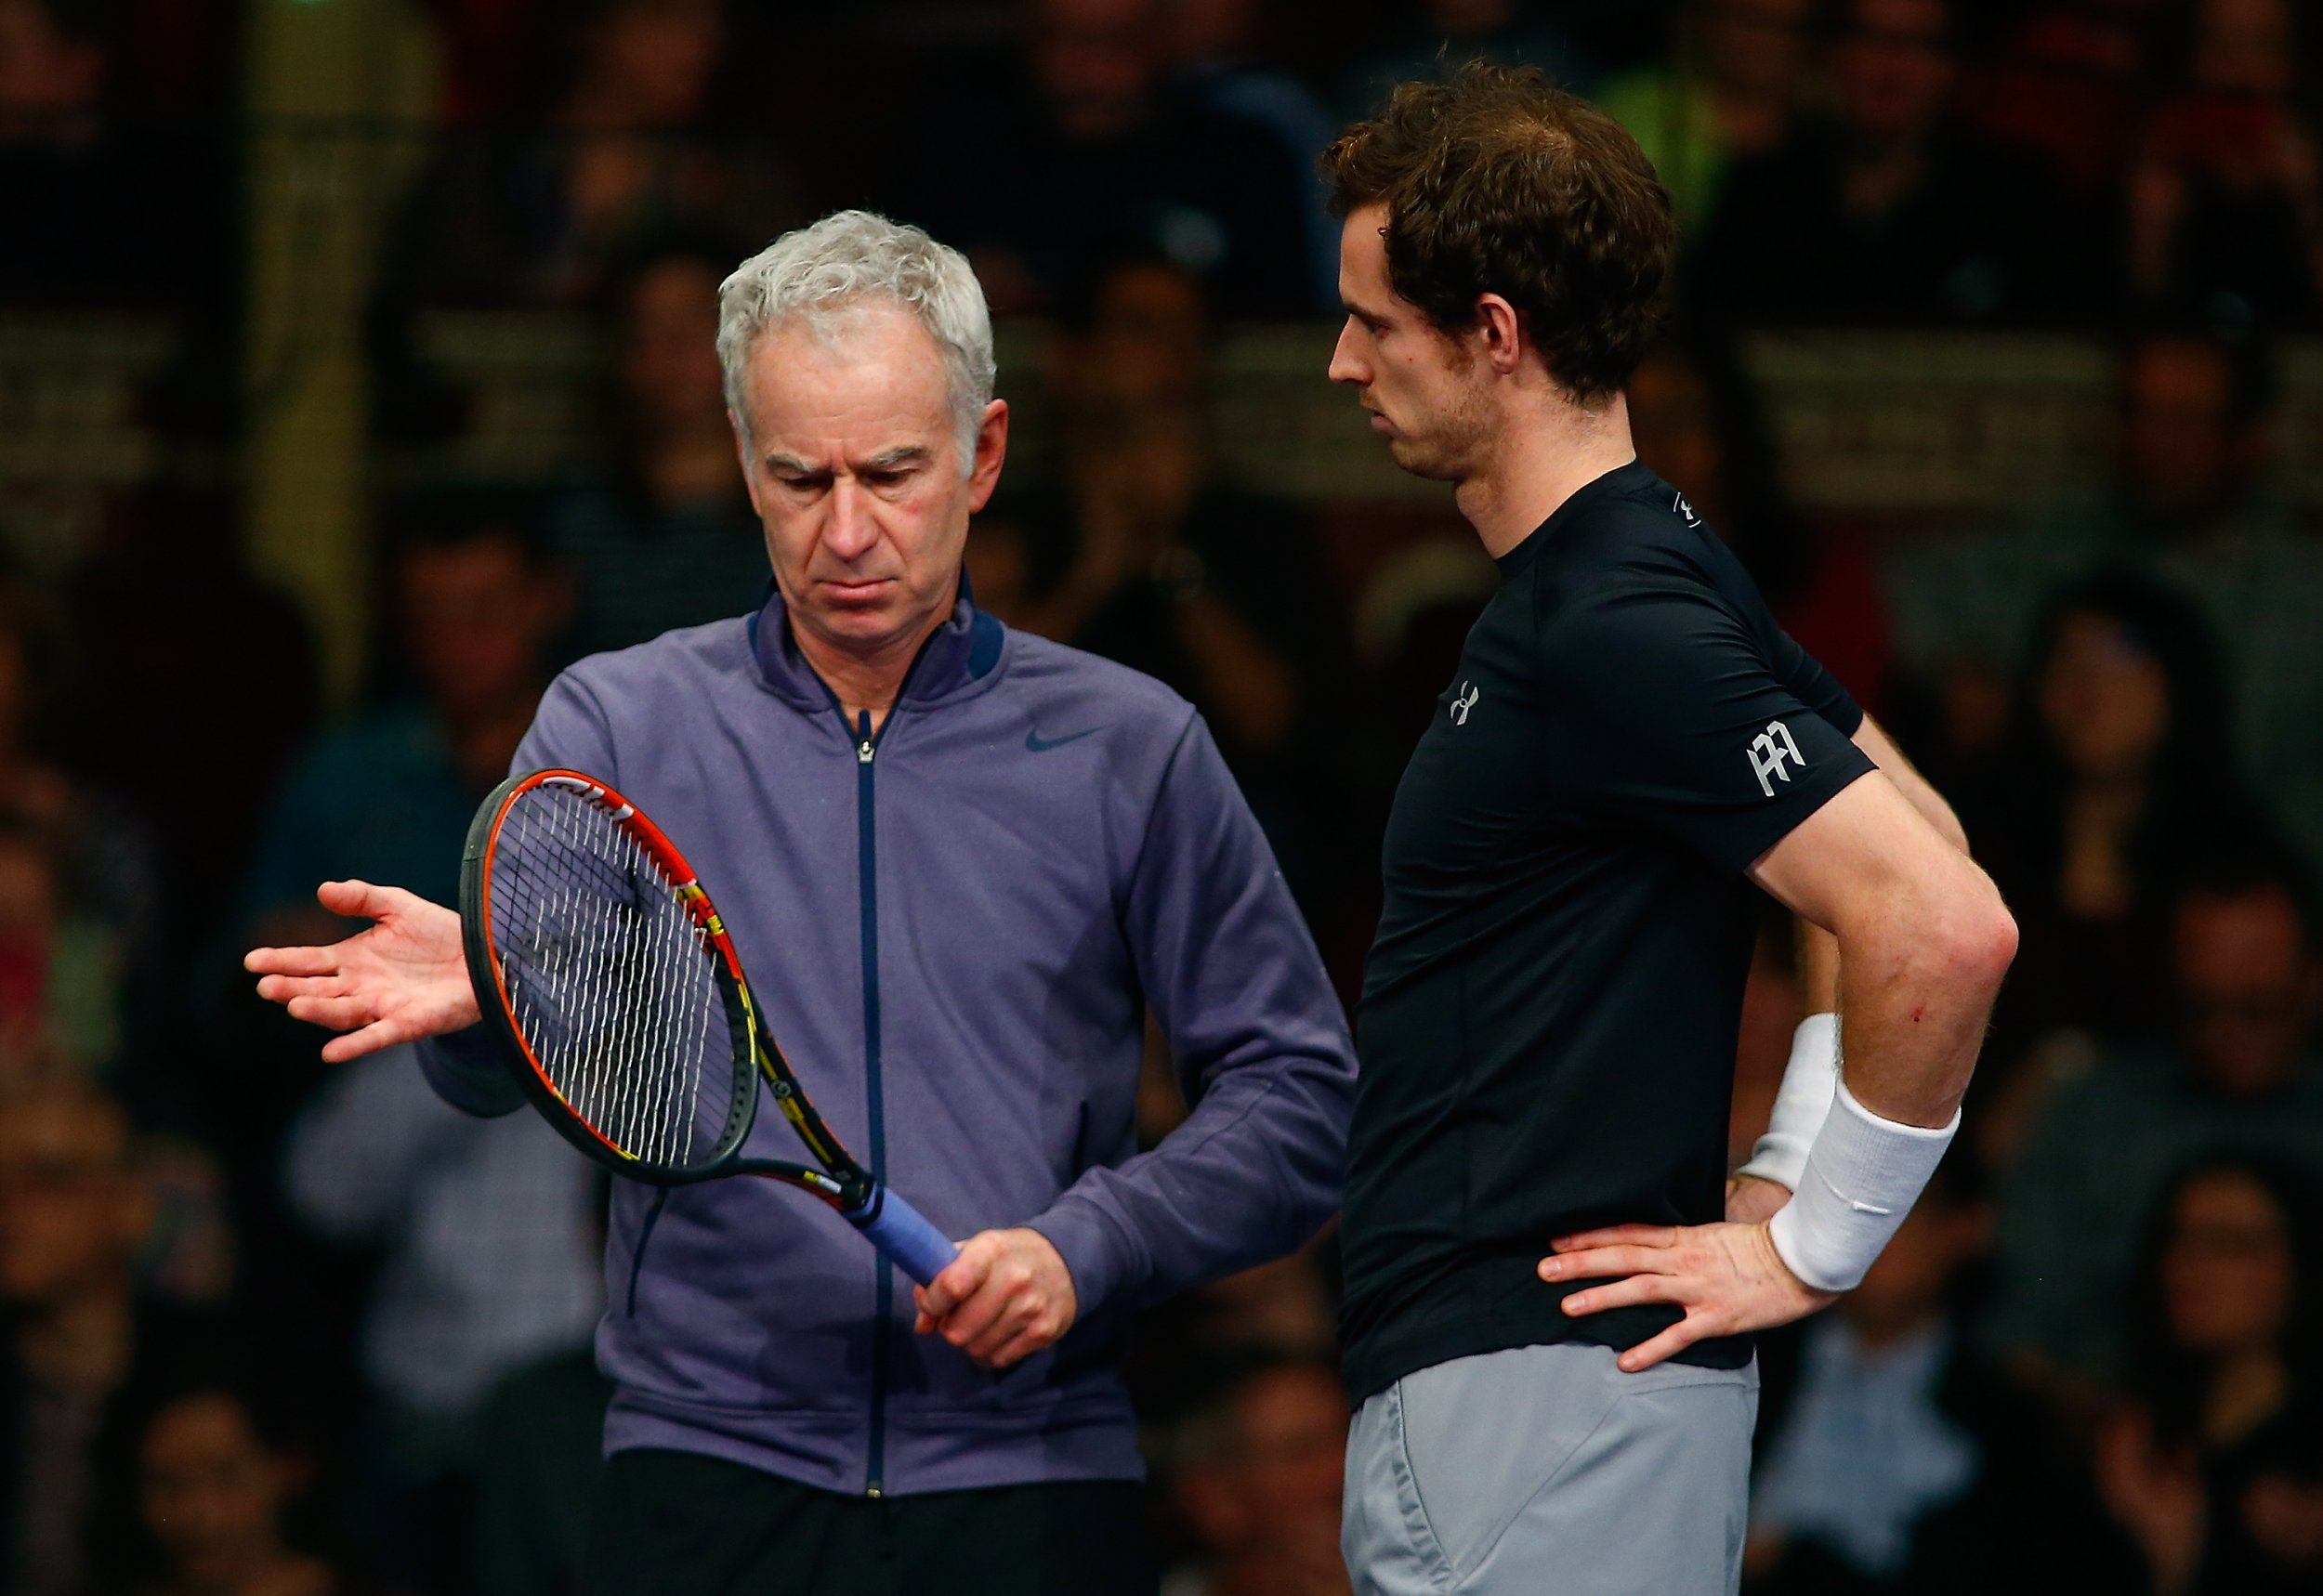 John McEnroe Andy Murray Will Face Intense Scrutiny at Australian